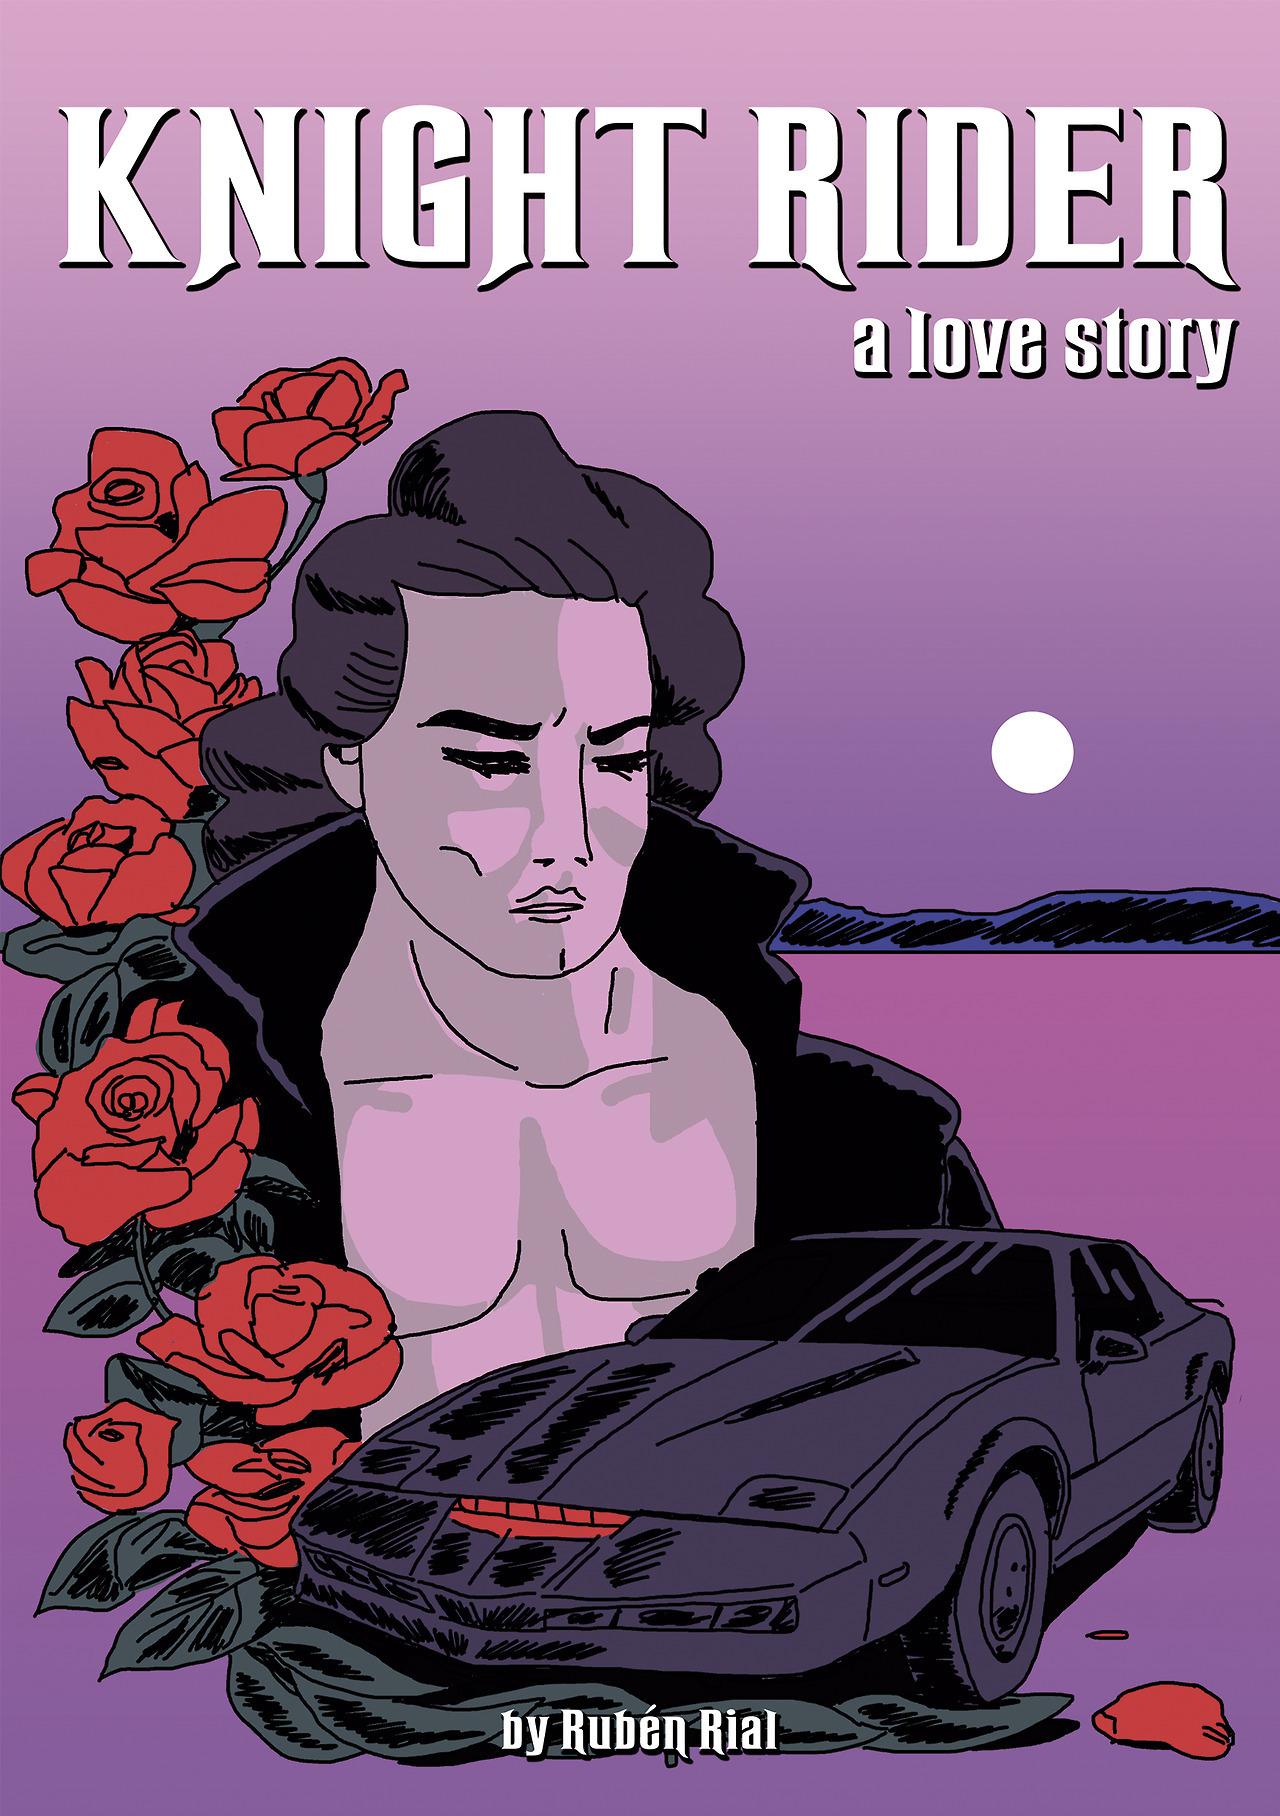 Knight Rider - A love story